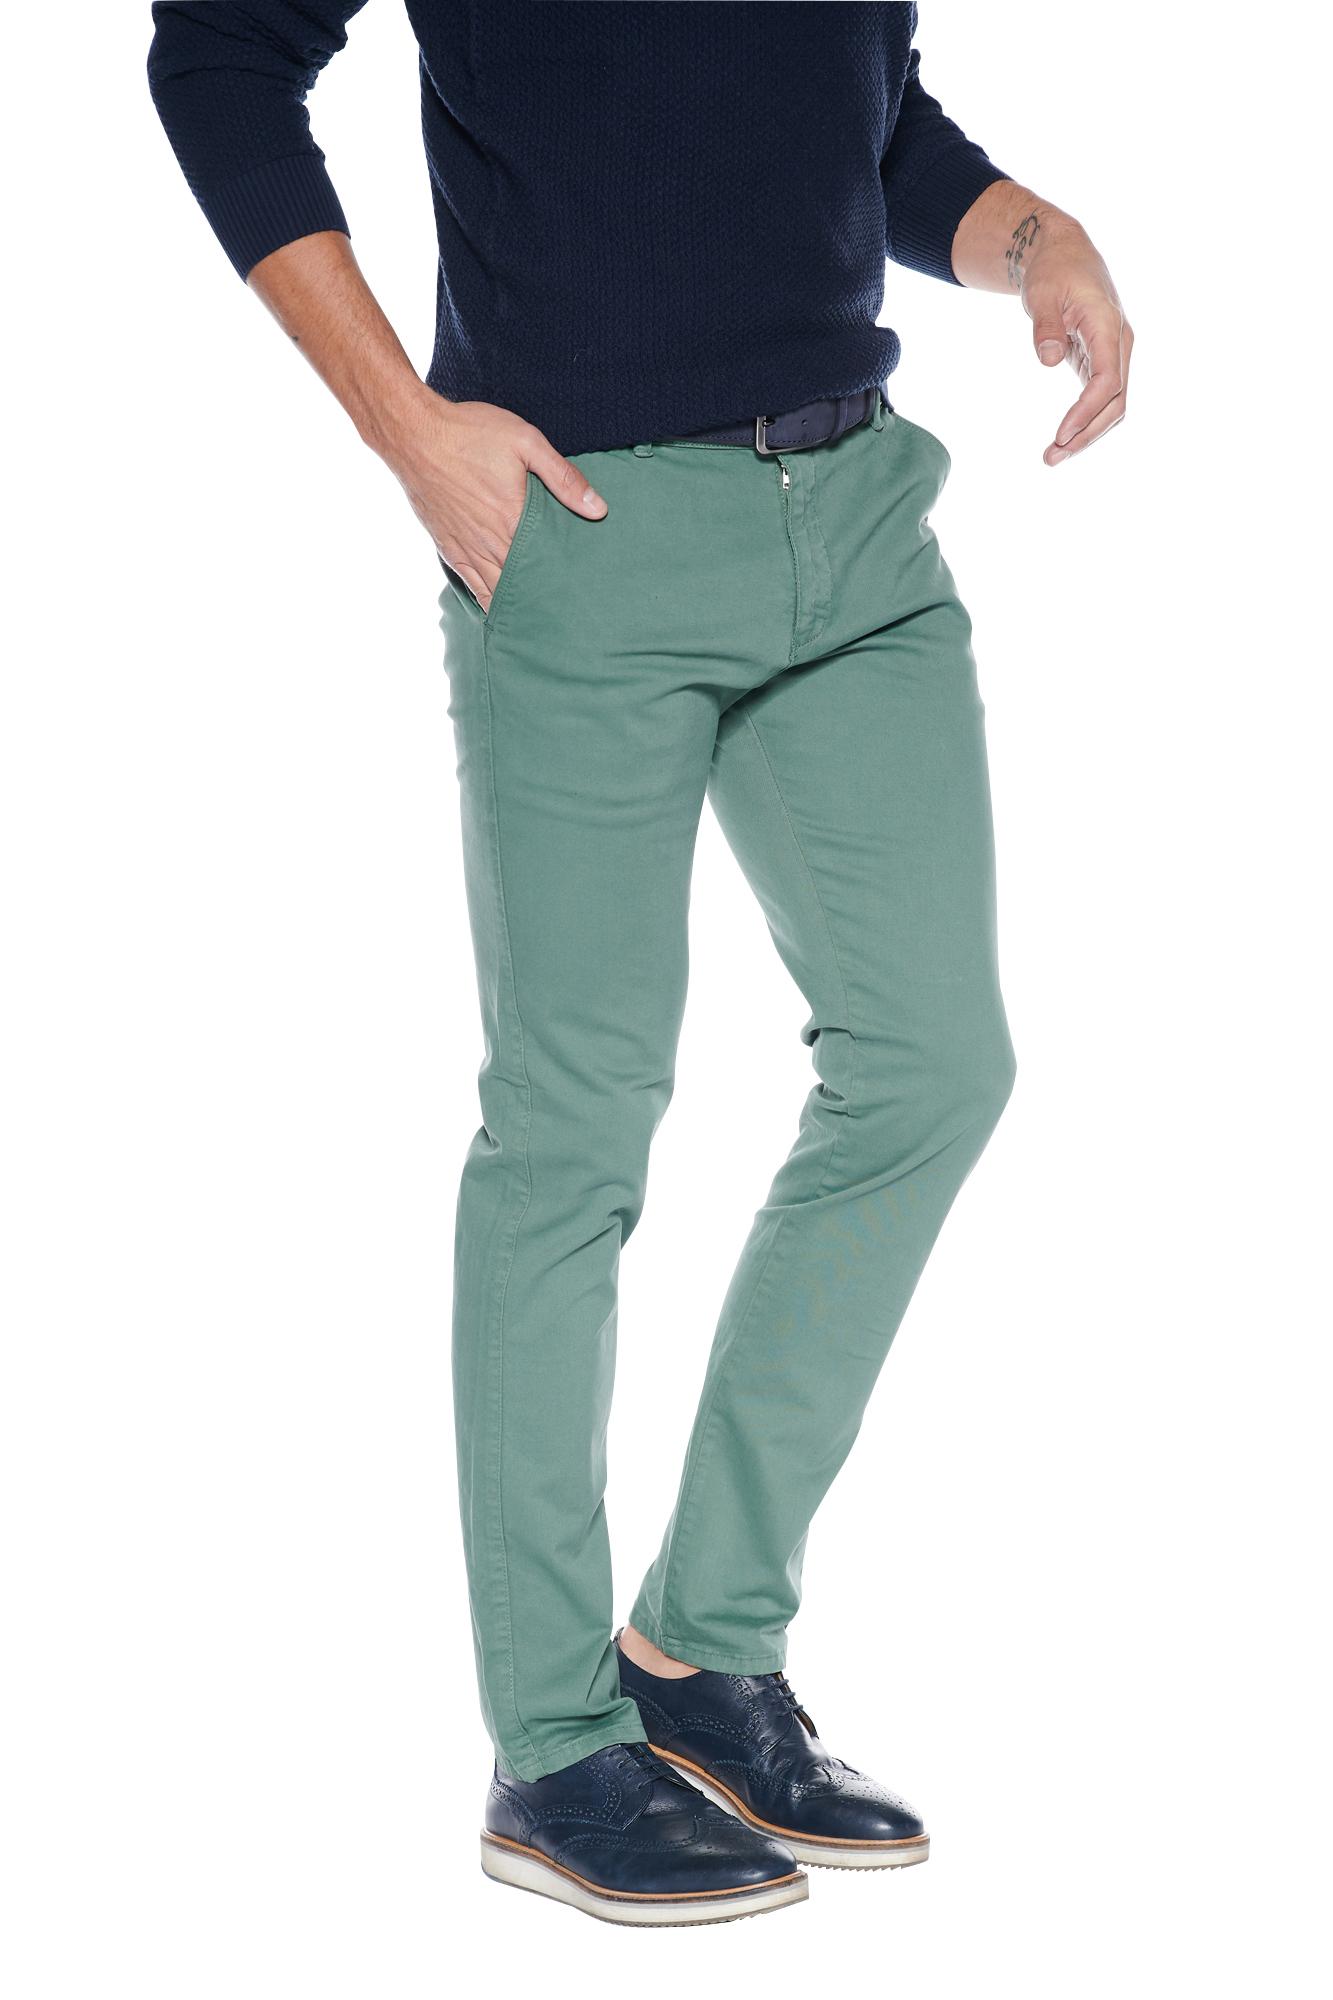 HeRougeot DENIM Homme Slim Chino Pantalons Slim Homme Fit Loisirs Business NEUF 38e44c